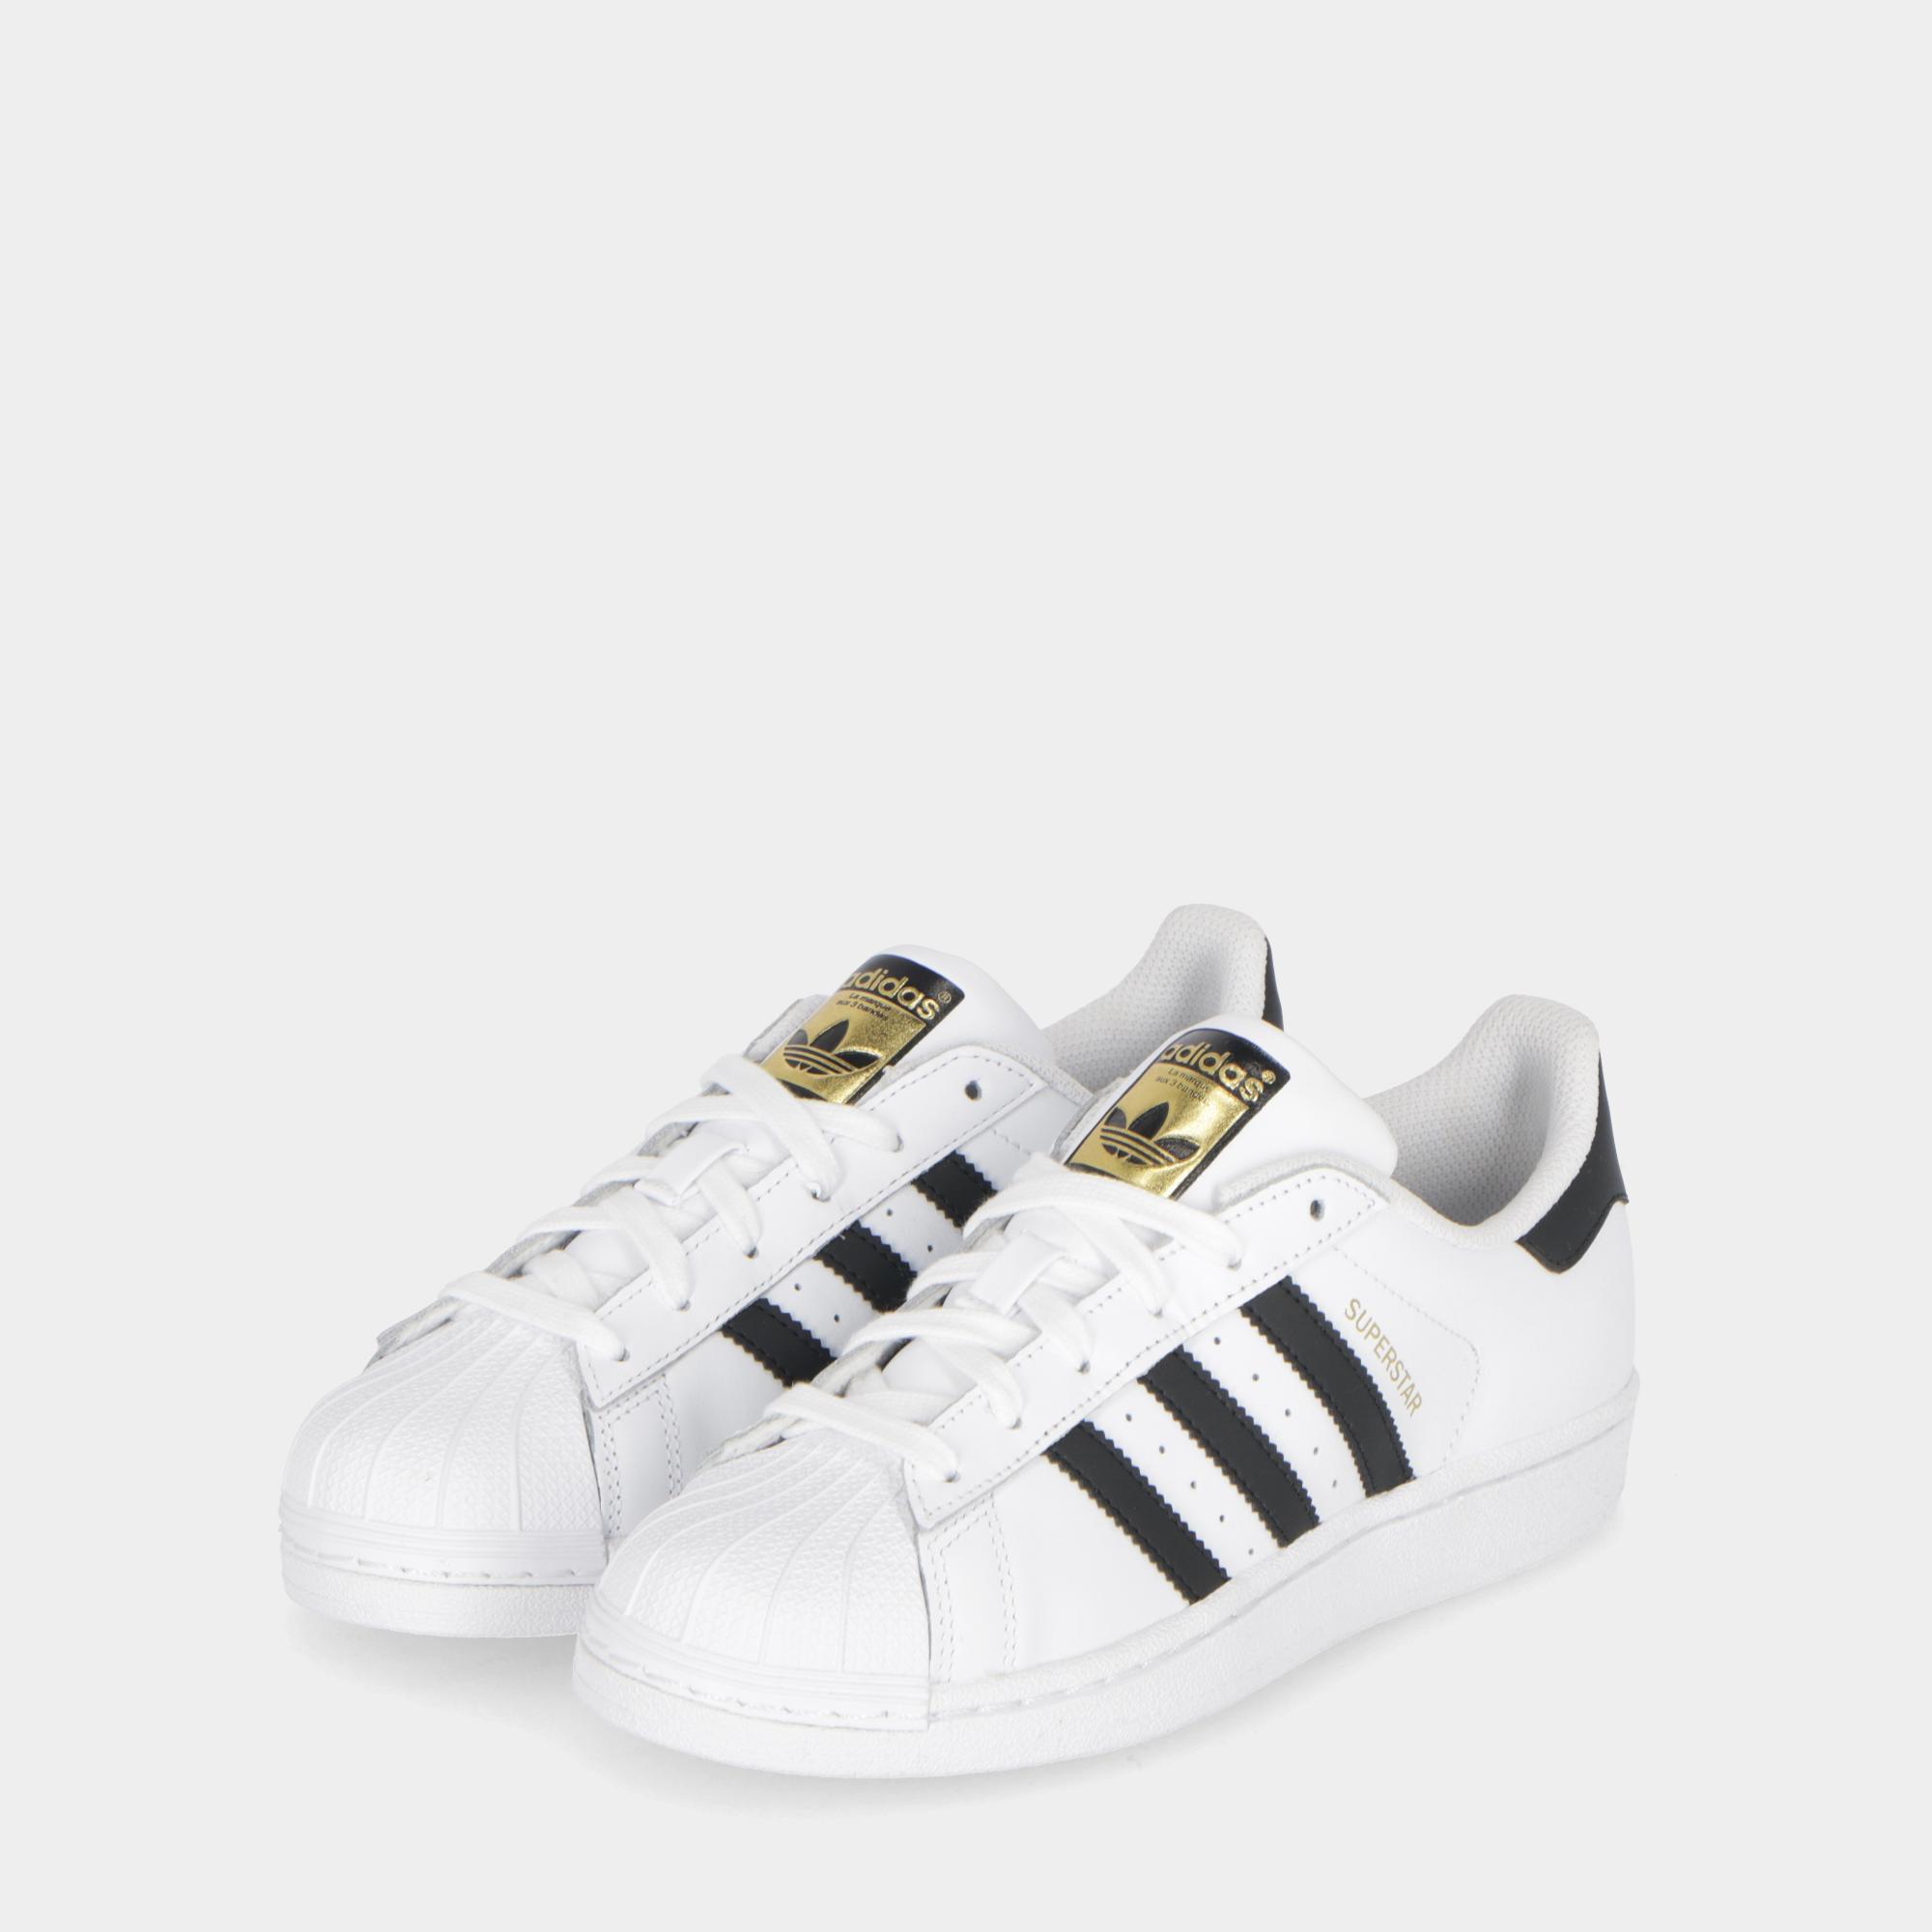 c5a548f0a5d36c Adidas Superstar - Kids White Black